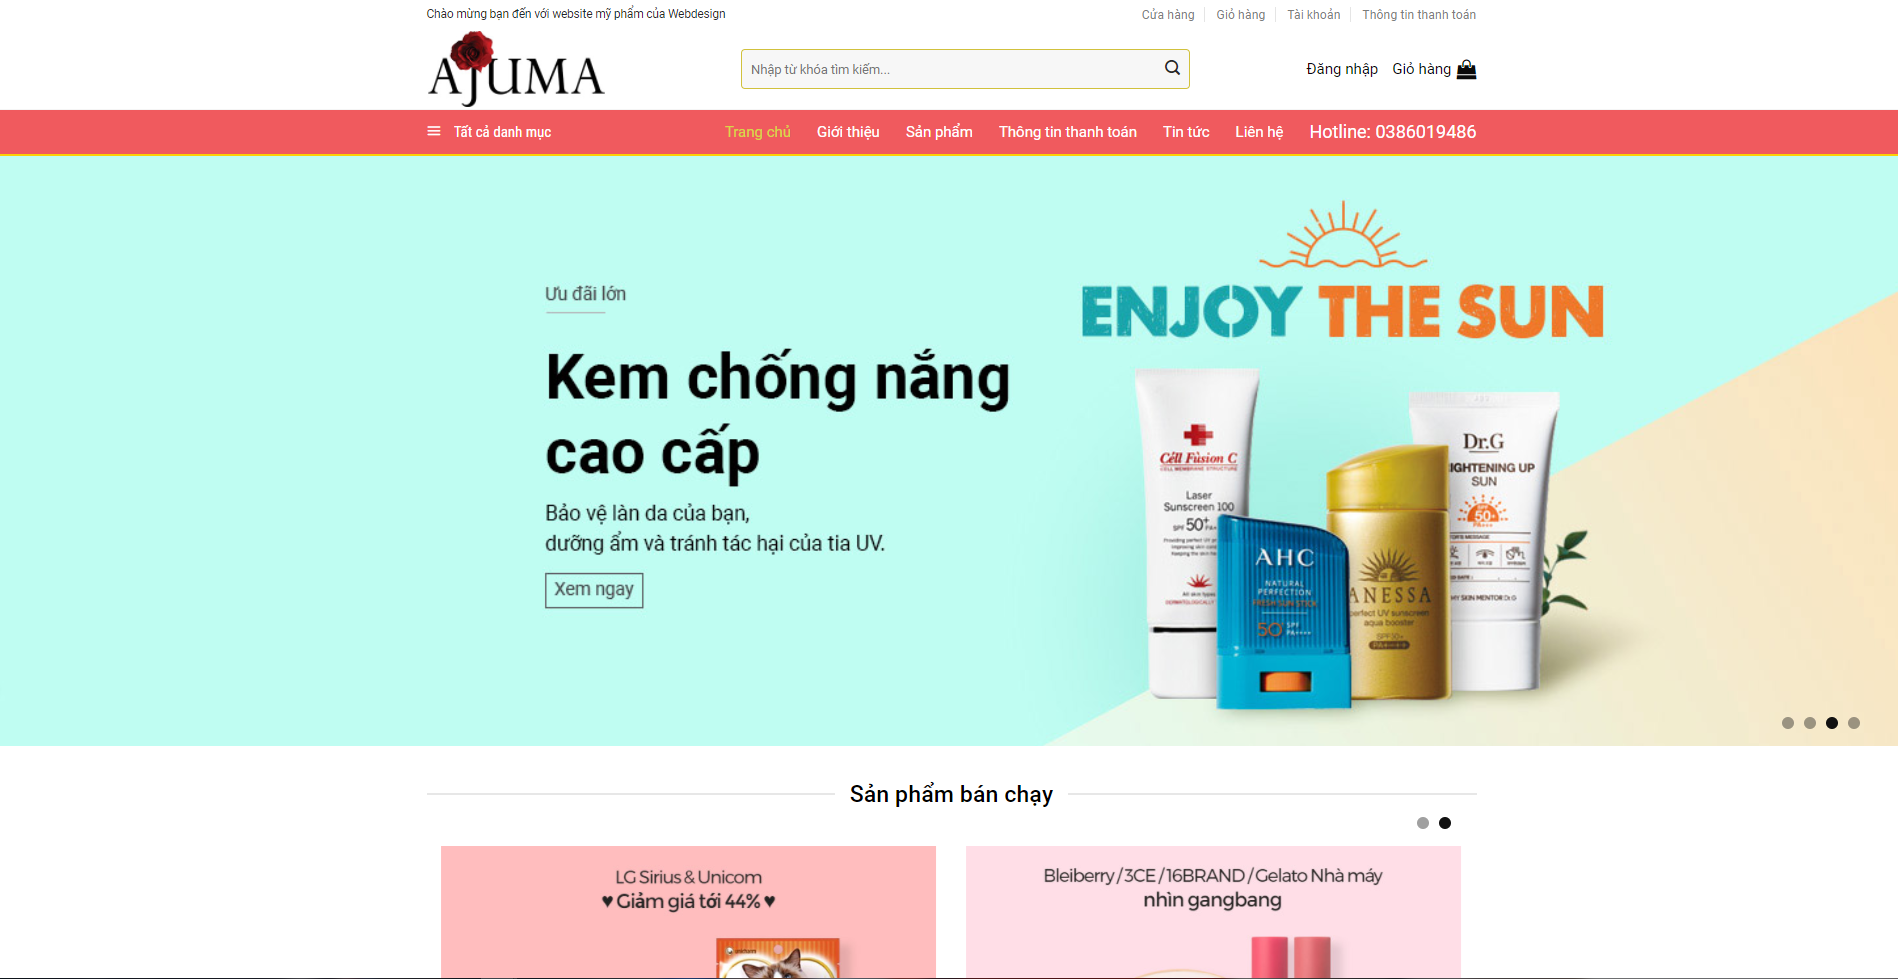 Web mỹ phẩm Ajuma